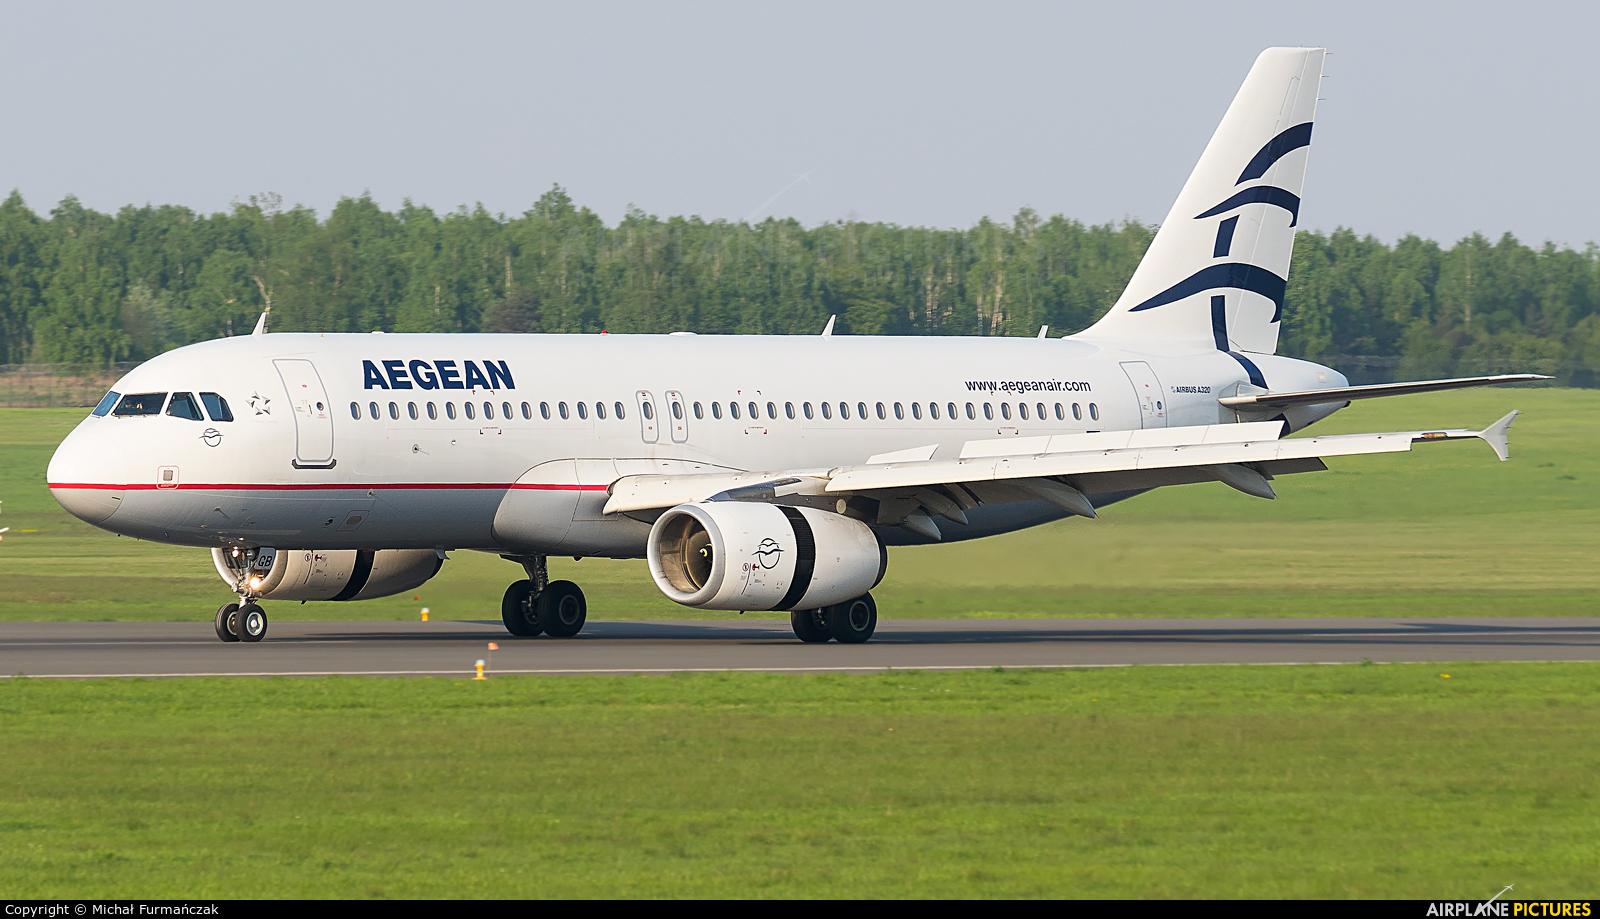 Aegean Airlines SX-DGB aircraft at Poznań - Ławica